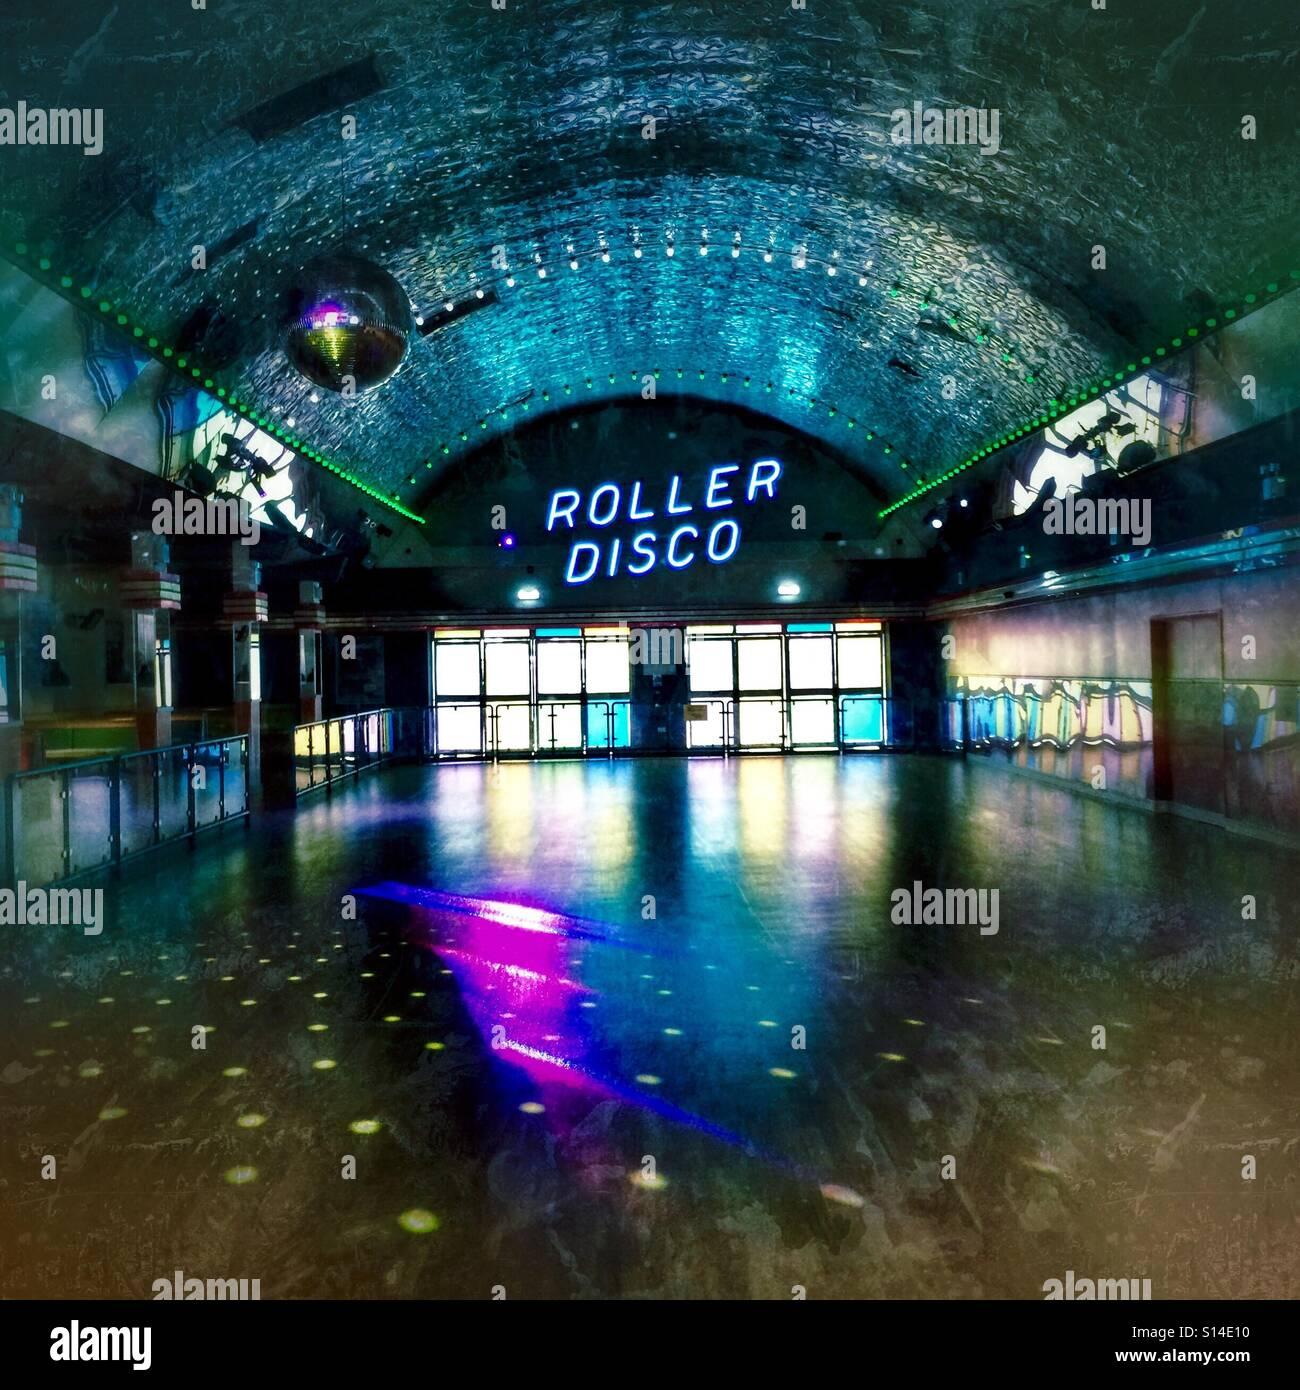 Roller Disco Stock Photos Amp Roller Disco Stock Images Alamy